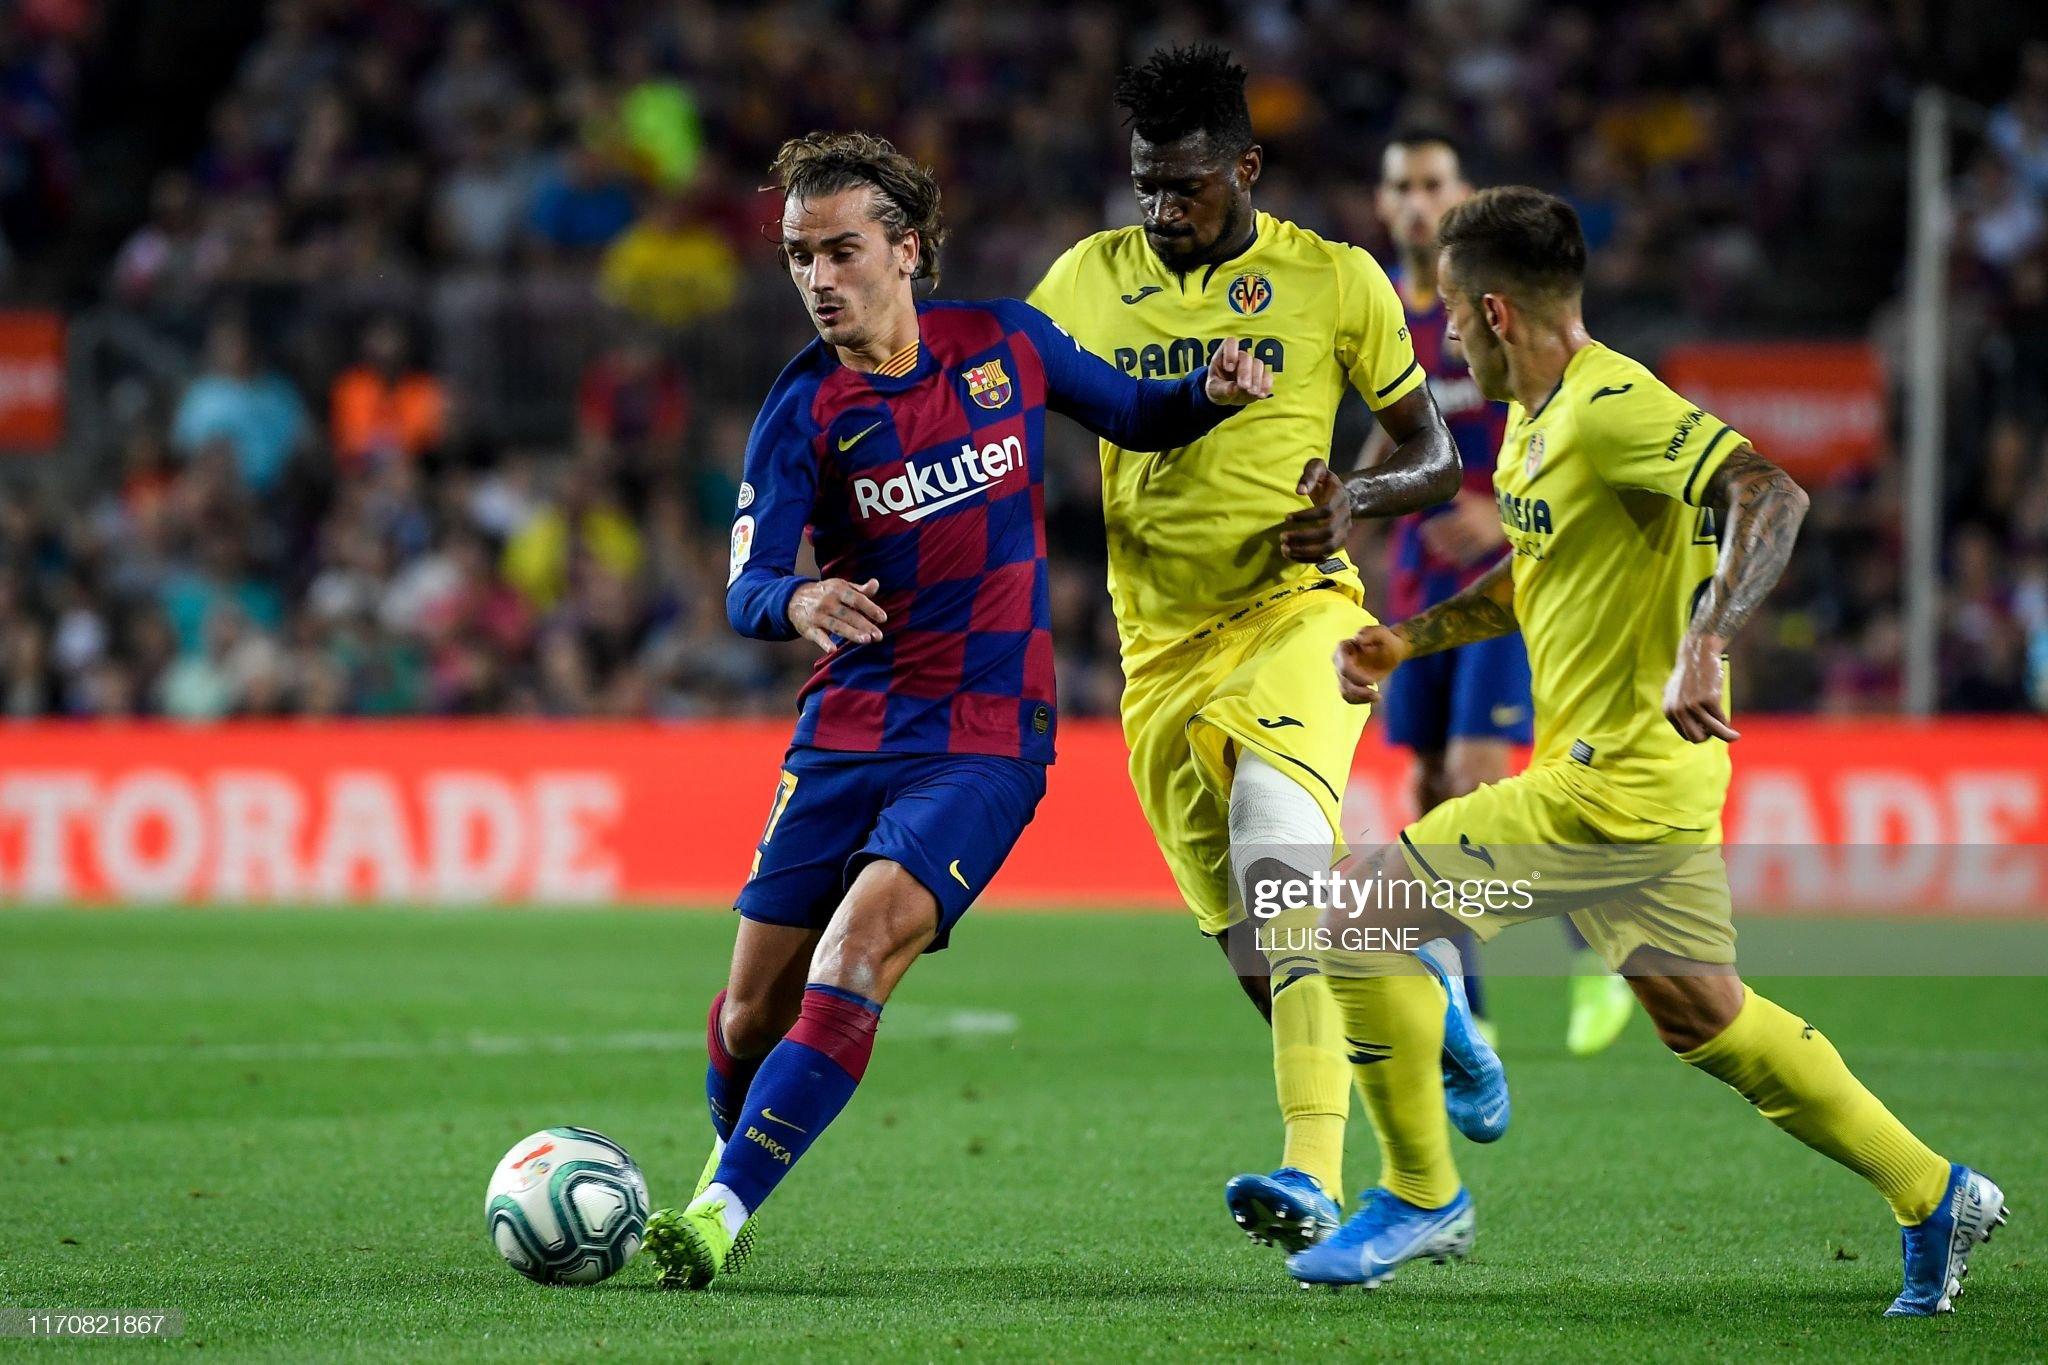 صور مباراة : برشلونة - فياريال 2-1 ( 24-09-2019 )  Barcelonas-french-forward-antoine-griezmann-vies-with-villarreals-picture-id1170821867?s=2048x2048